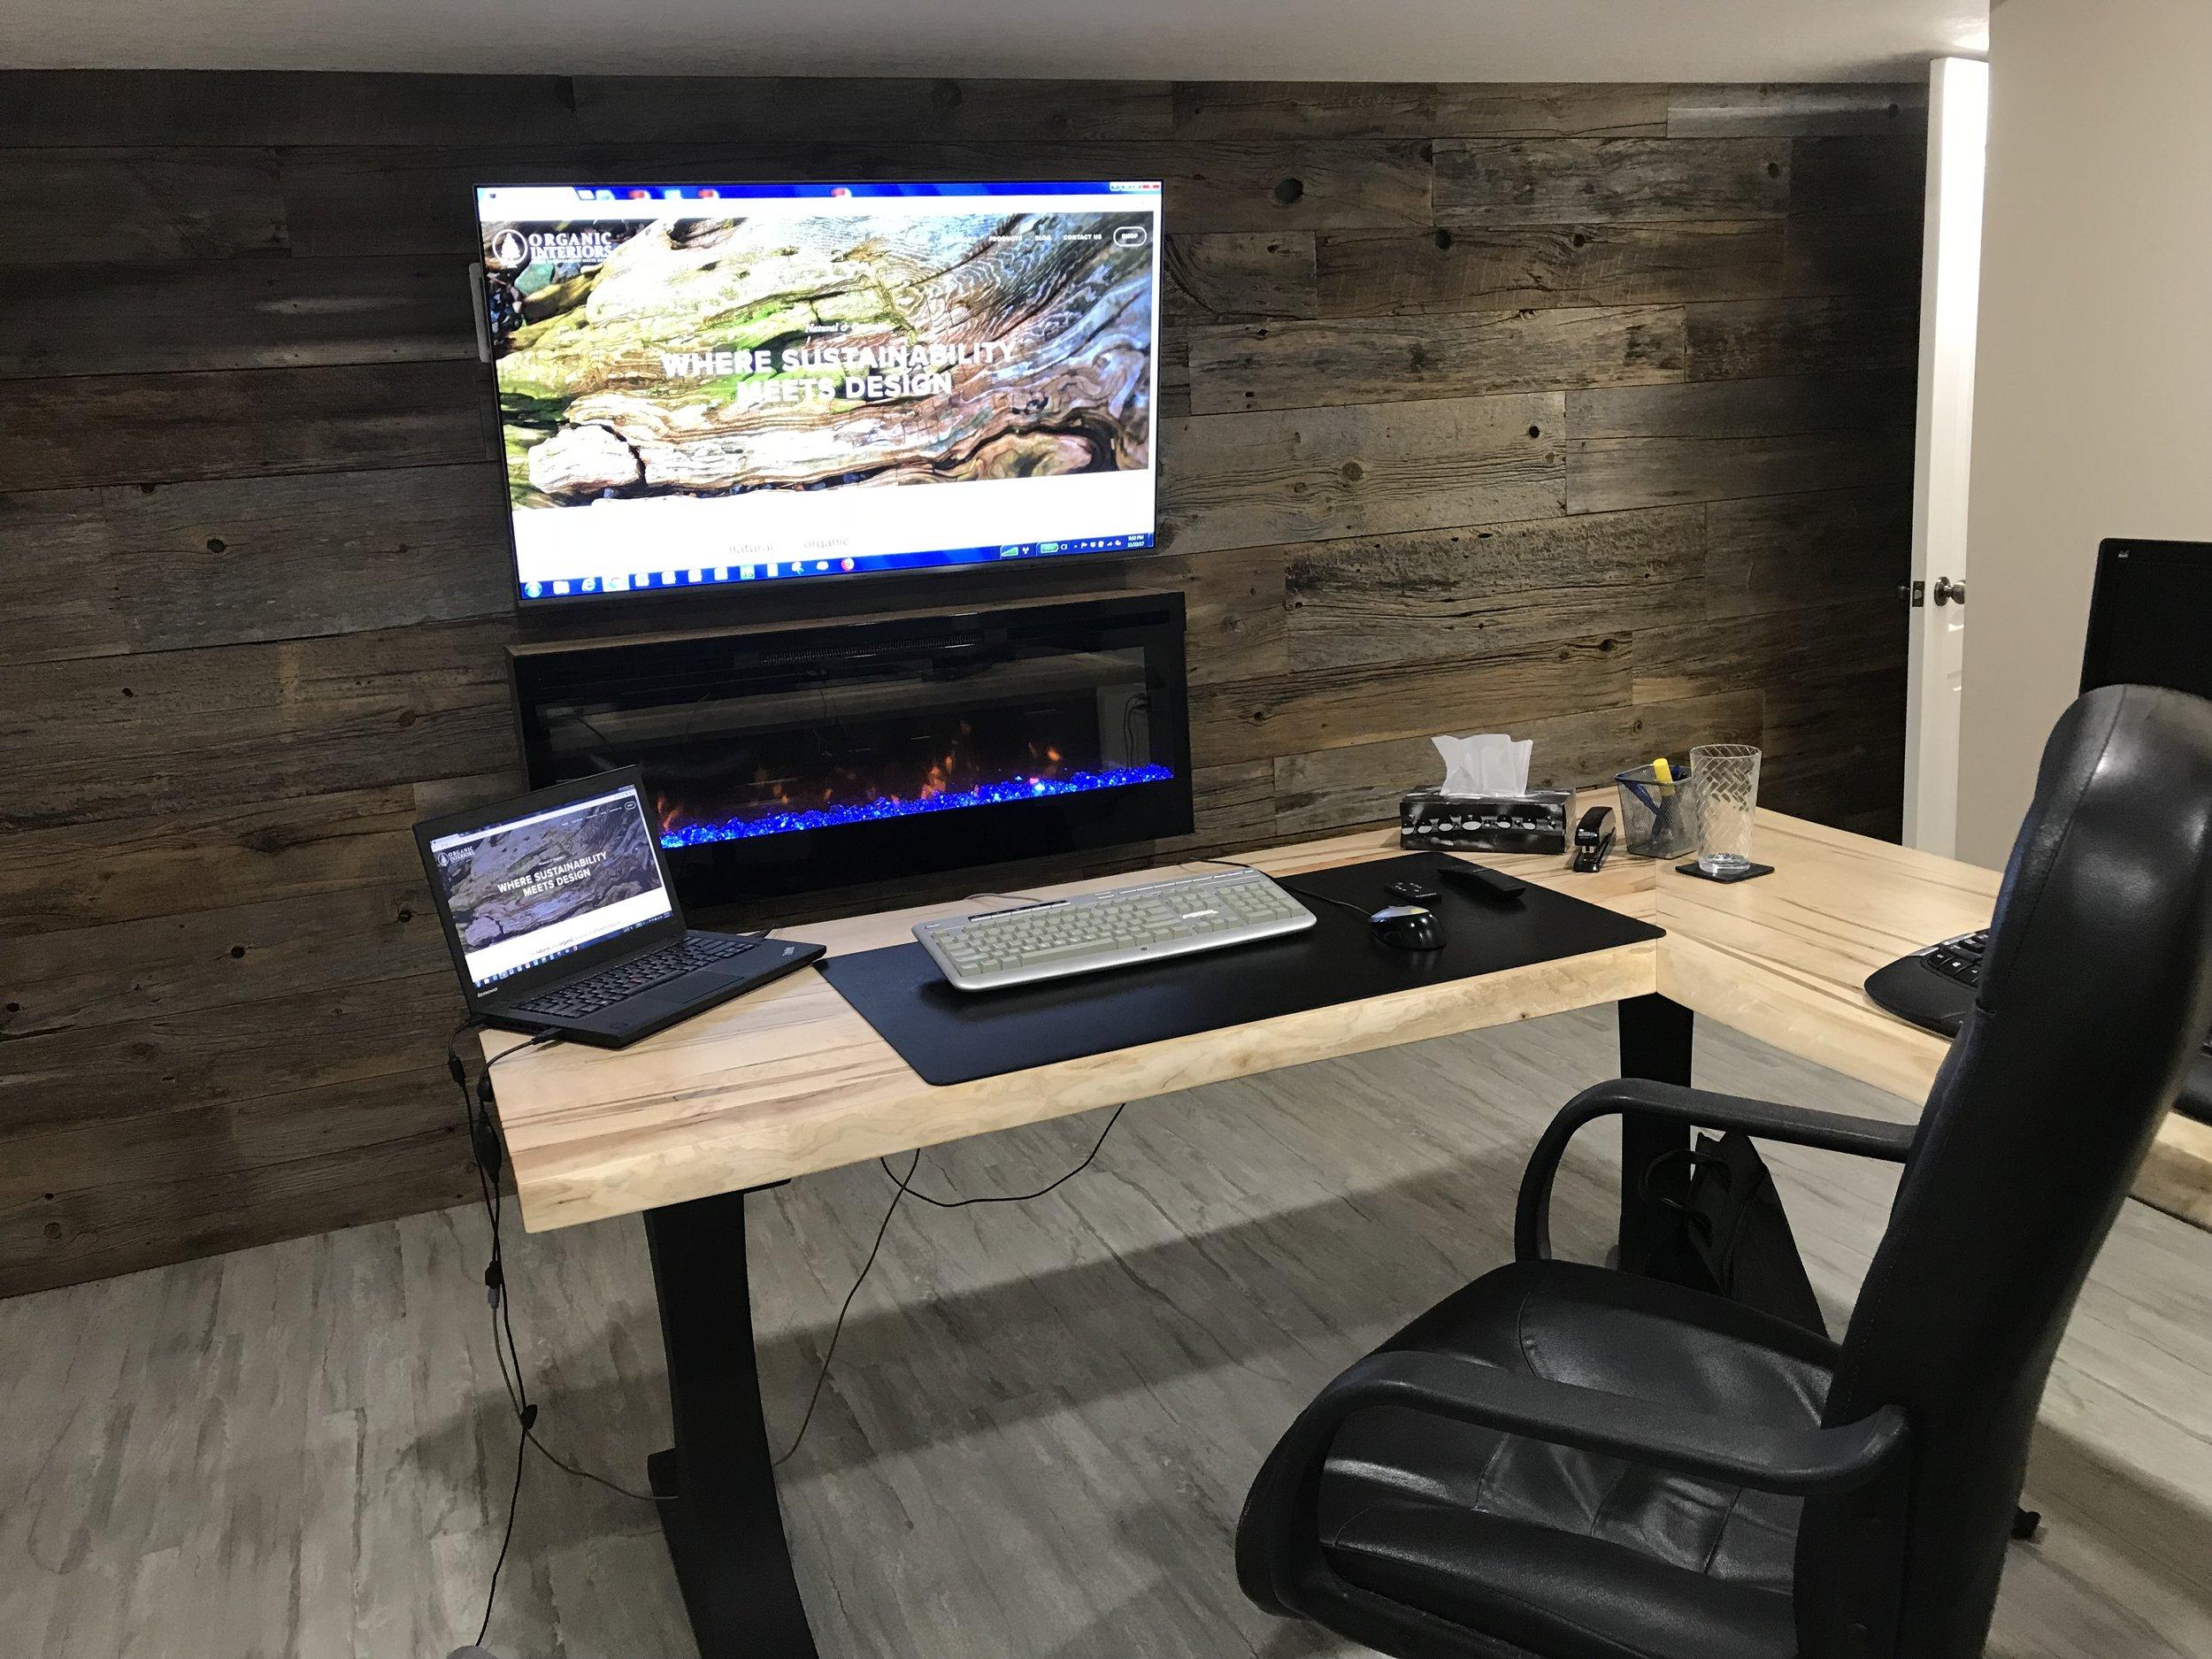 deskdan2.jpg